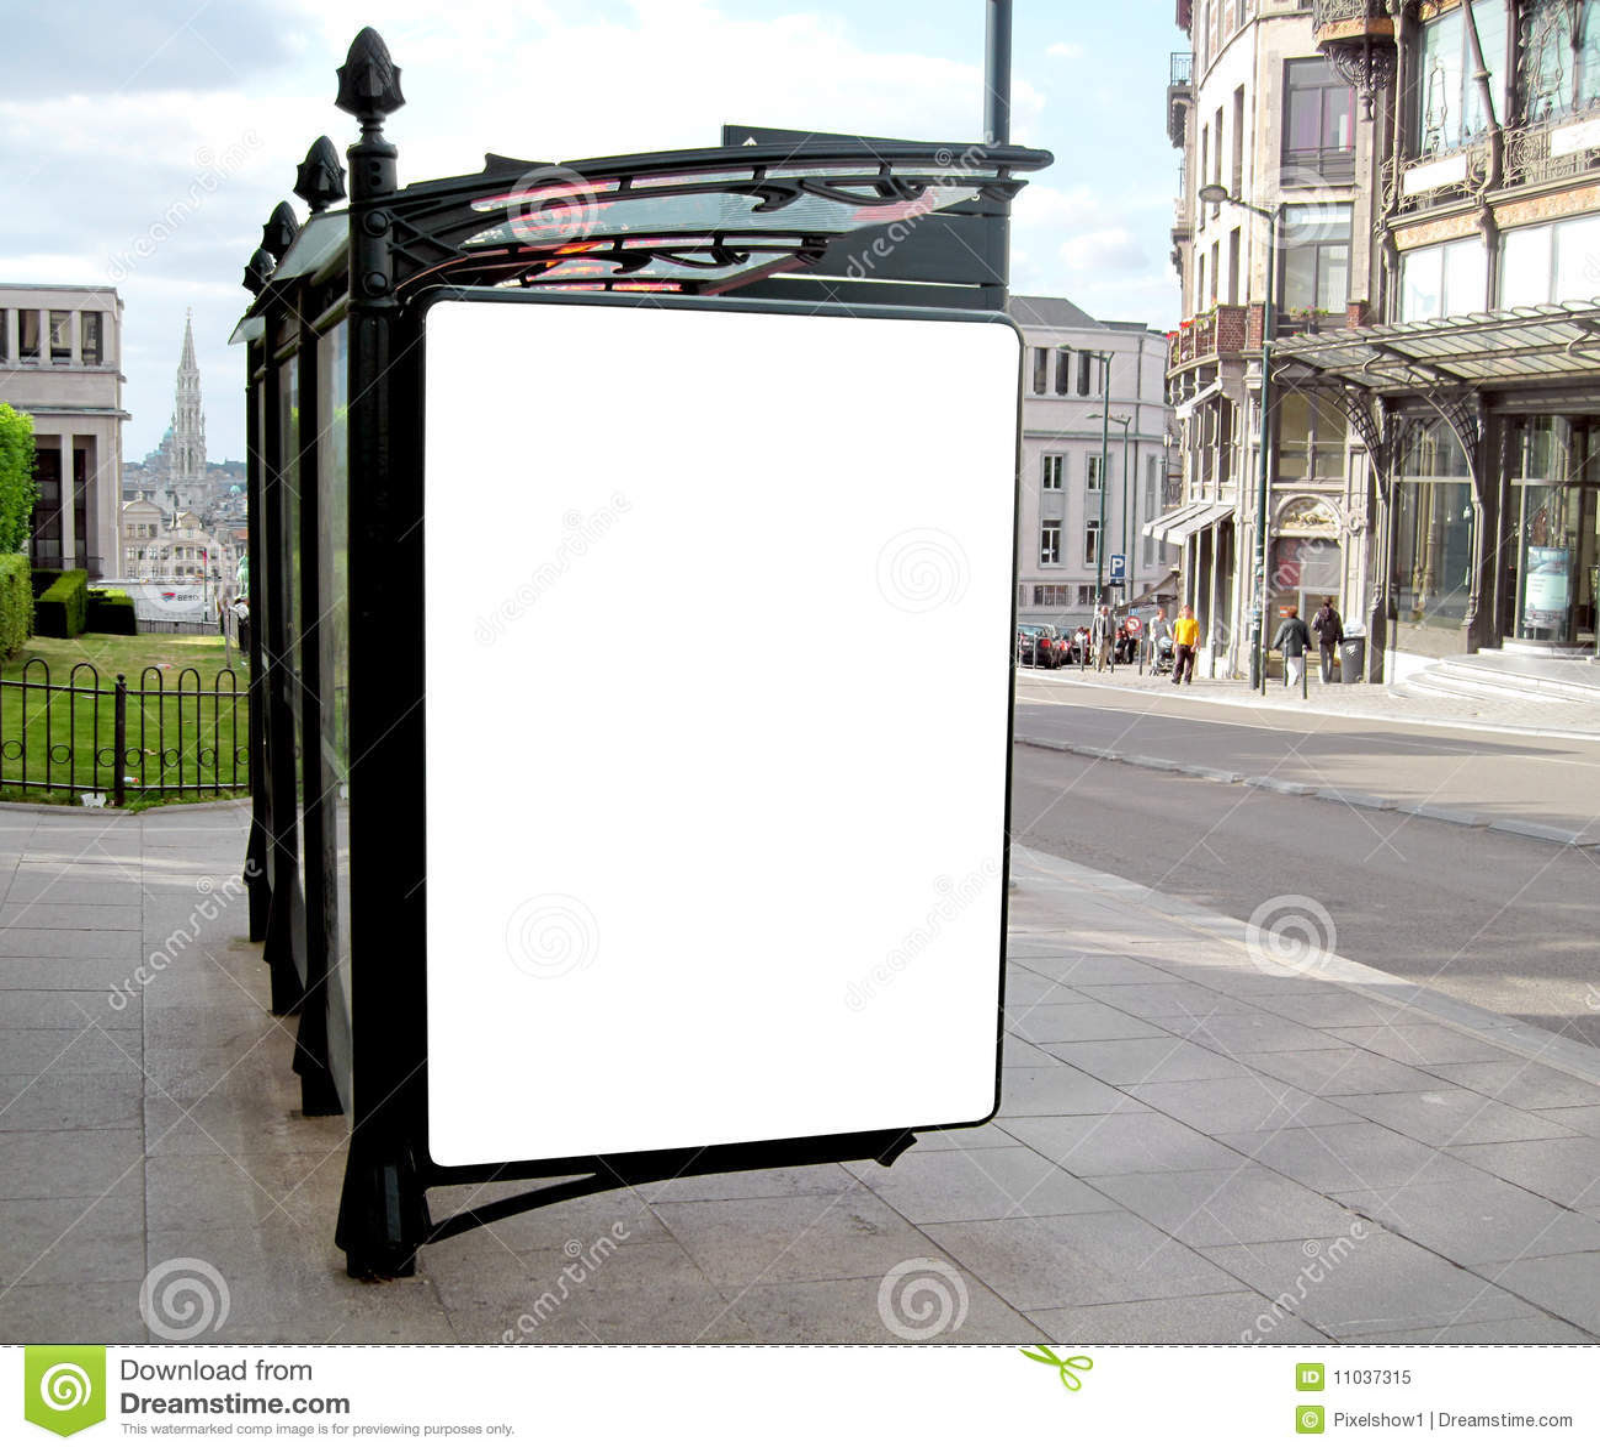 Blank Outdoor Billboard Stock Image - Image: 30795041